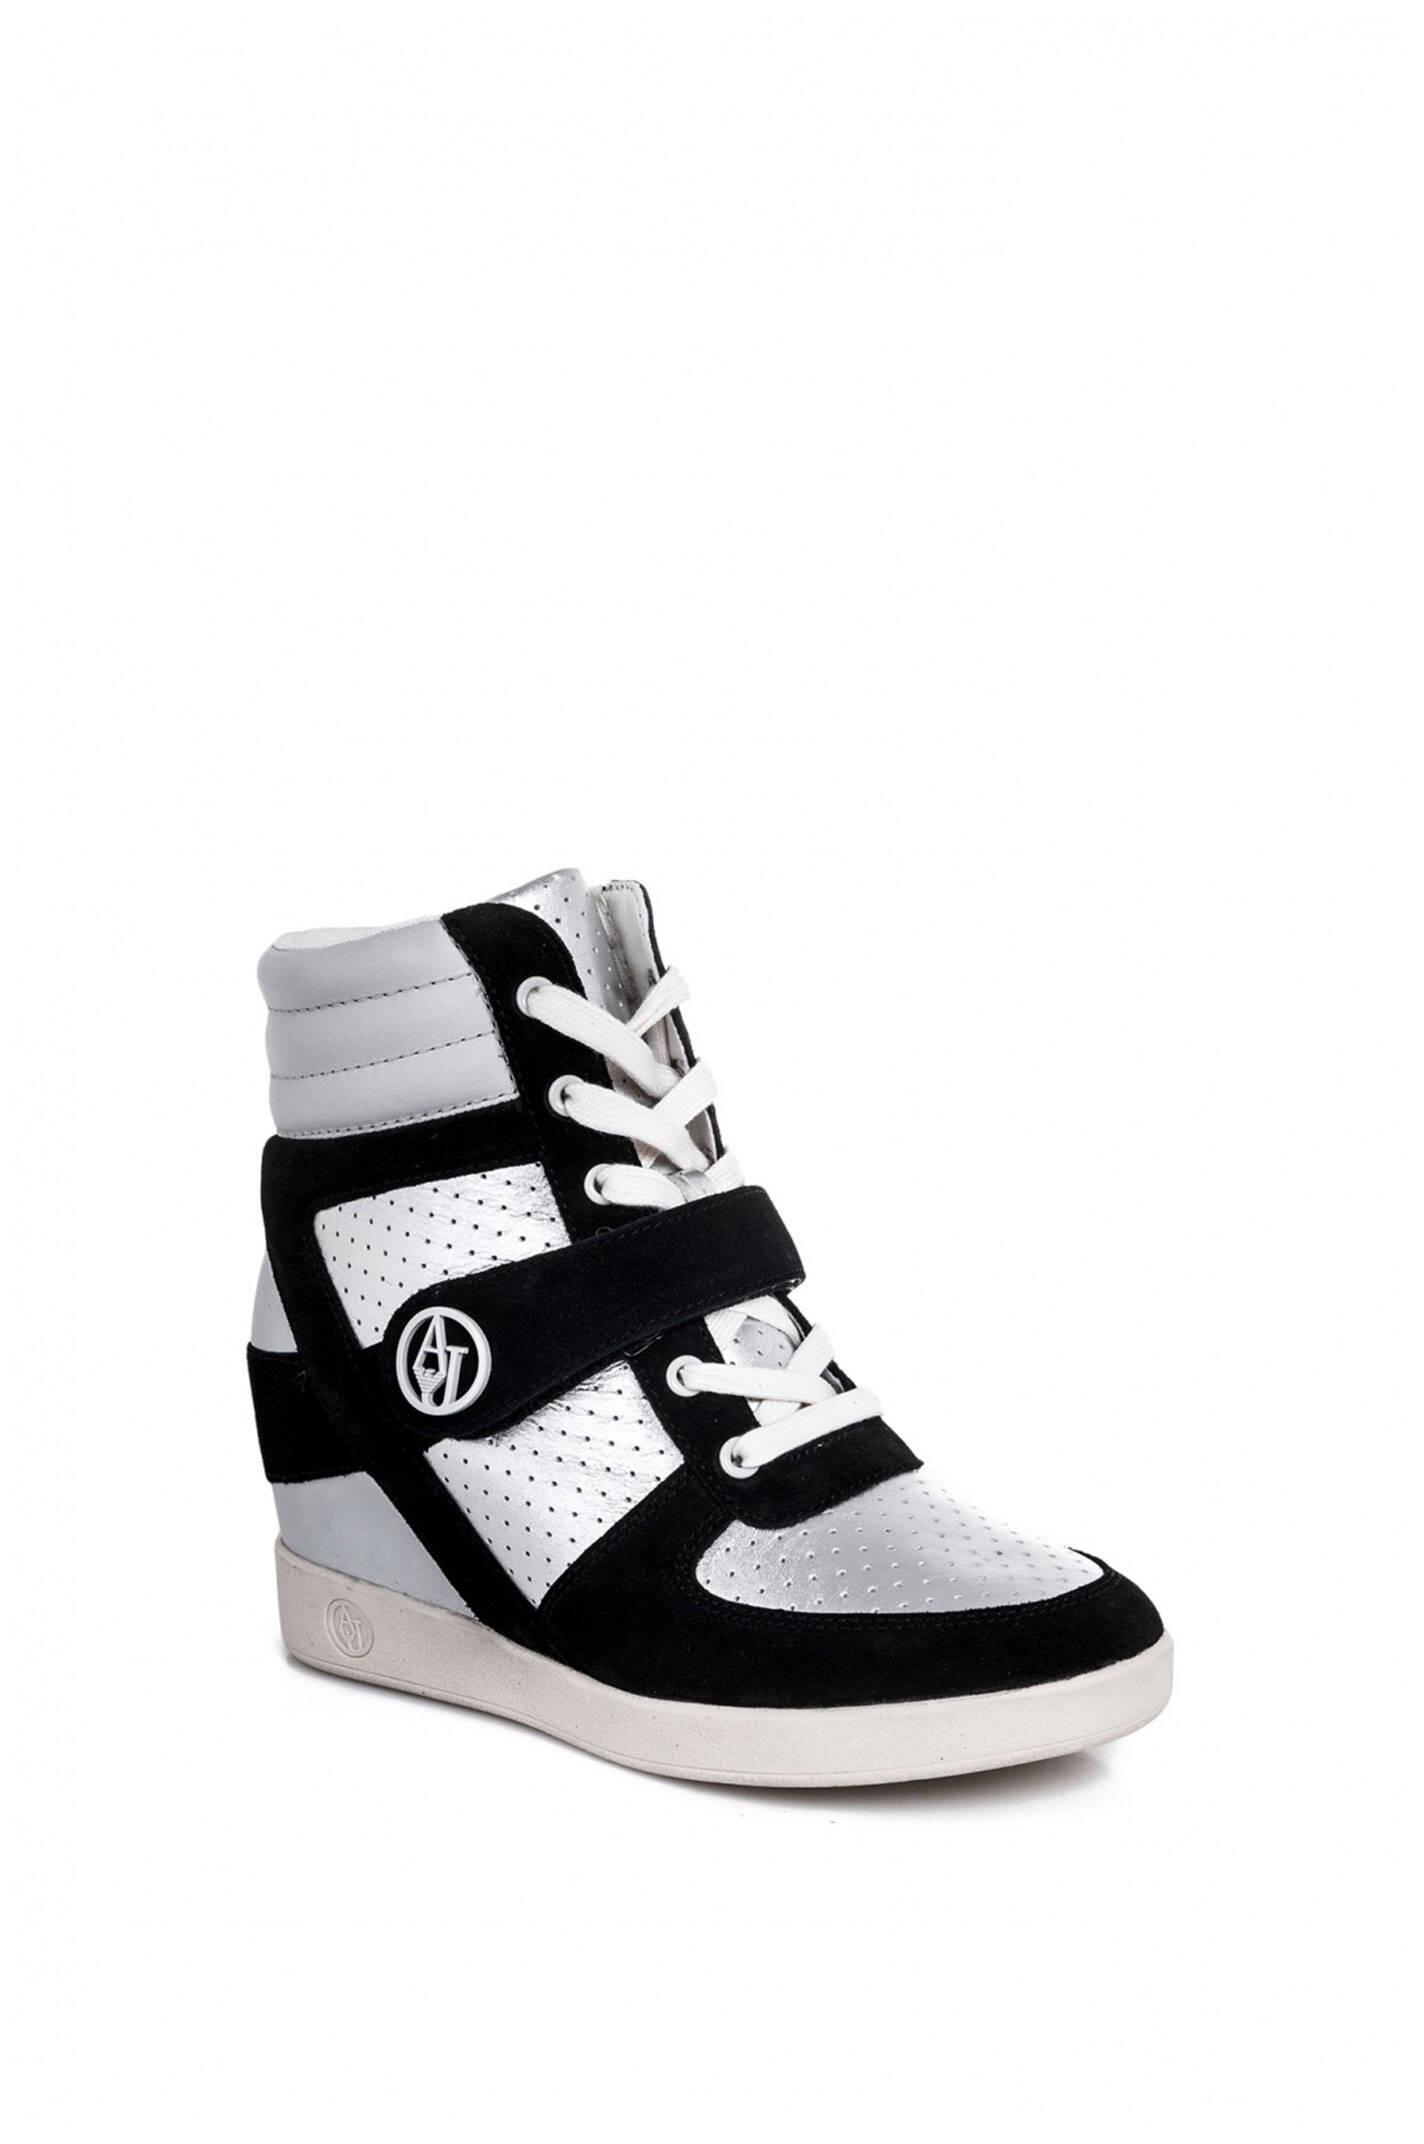 sneakers armani jeans black sneakers. Black Bedroom Furniture Sets. Home Design Ideas